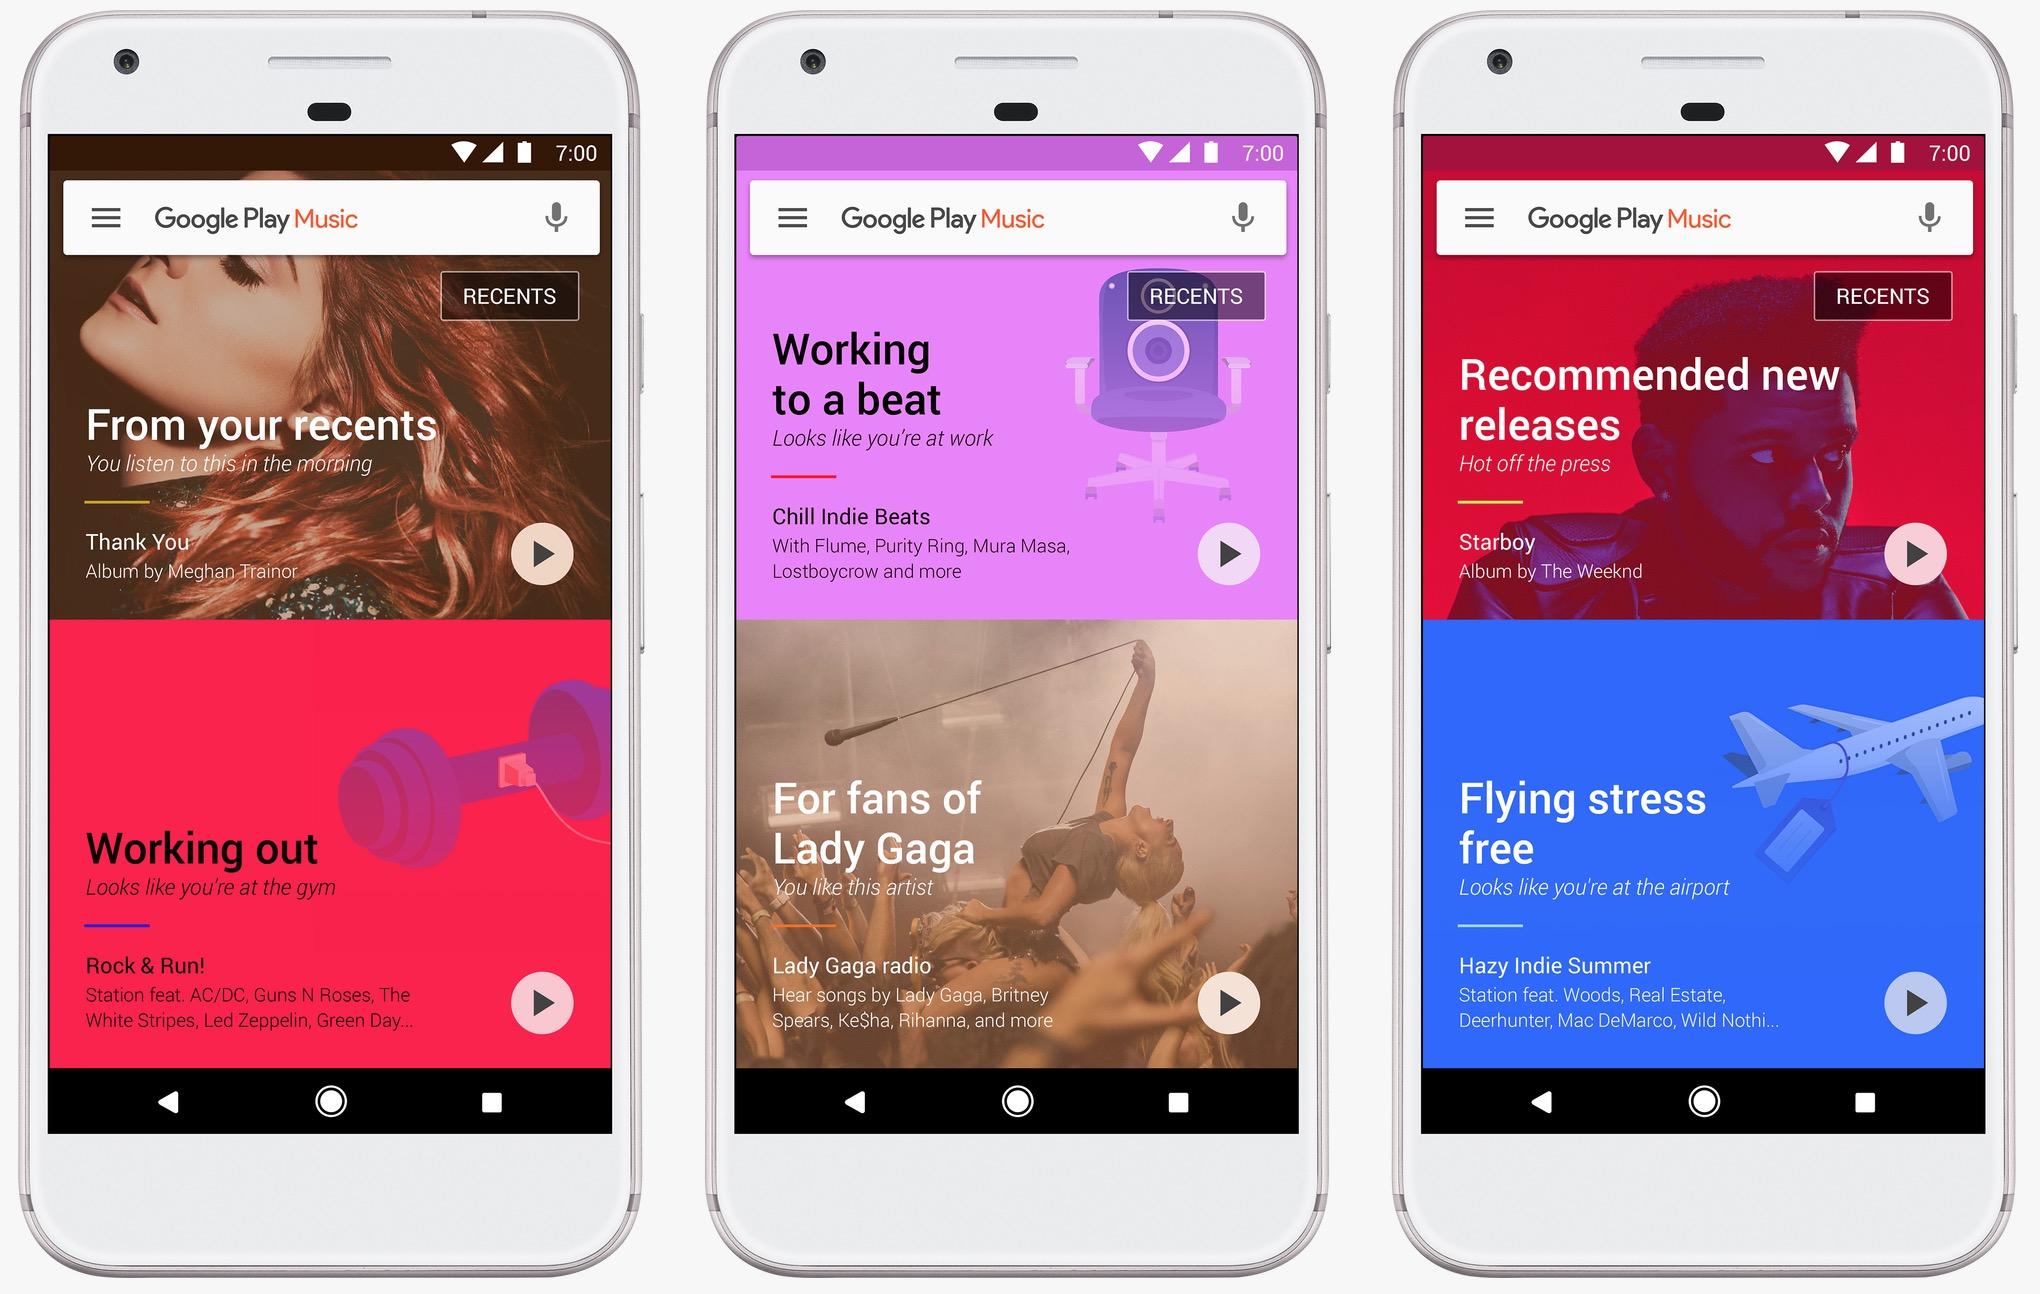 Google Play Music design